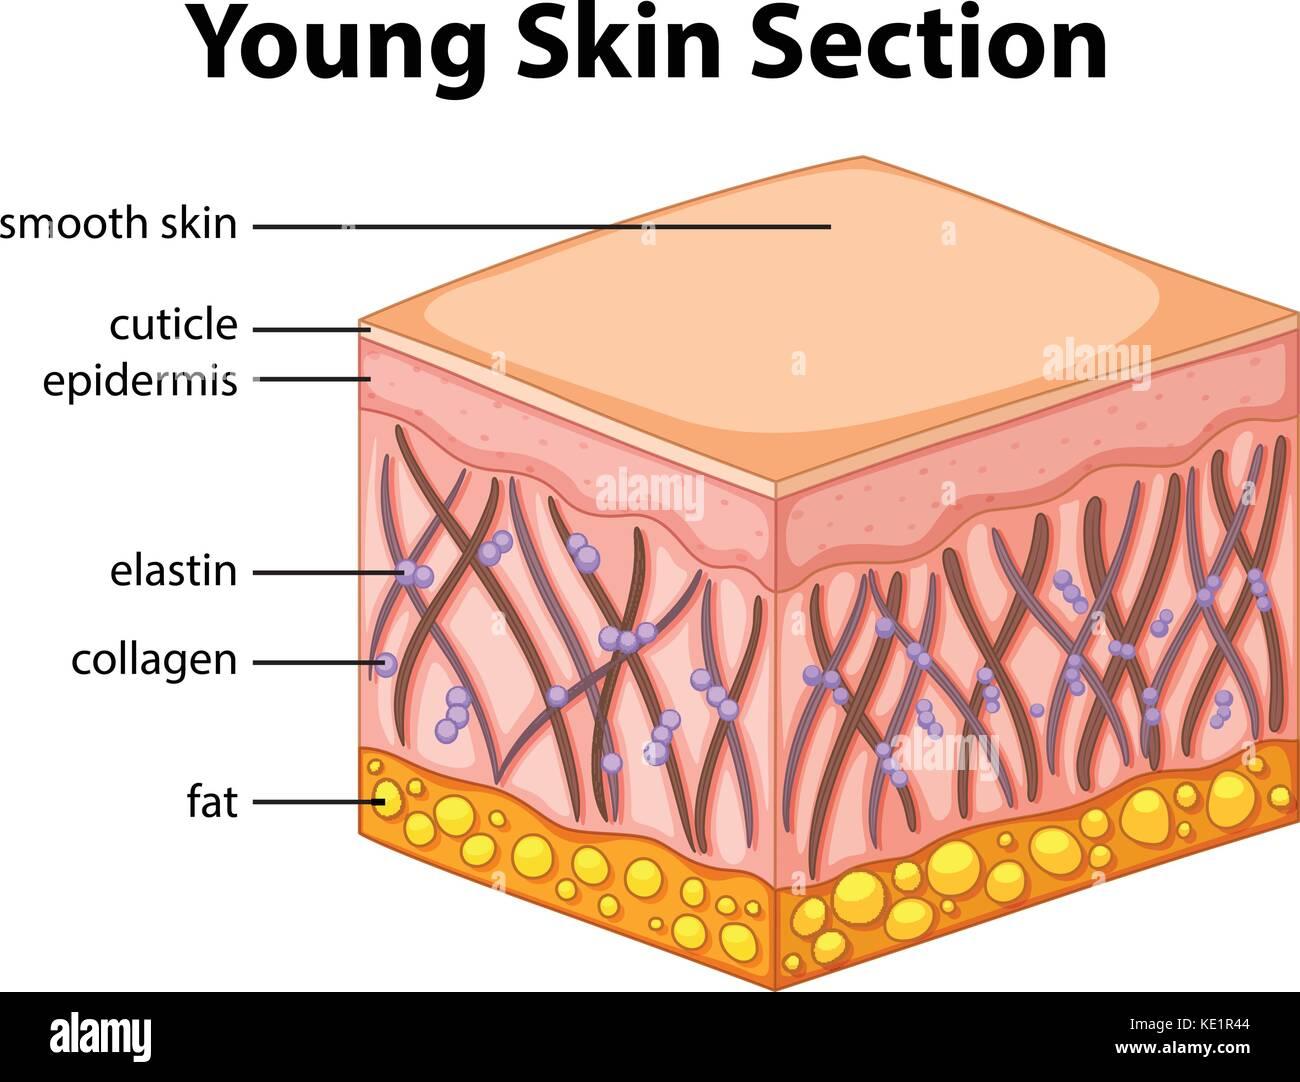 Skin Section Diagram Imágenes De Stock & Skin Section Diagram Fotos ...